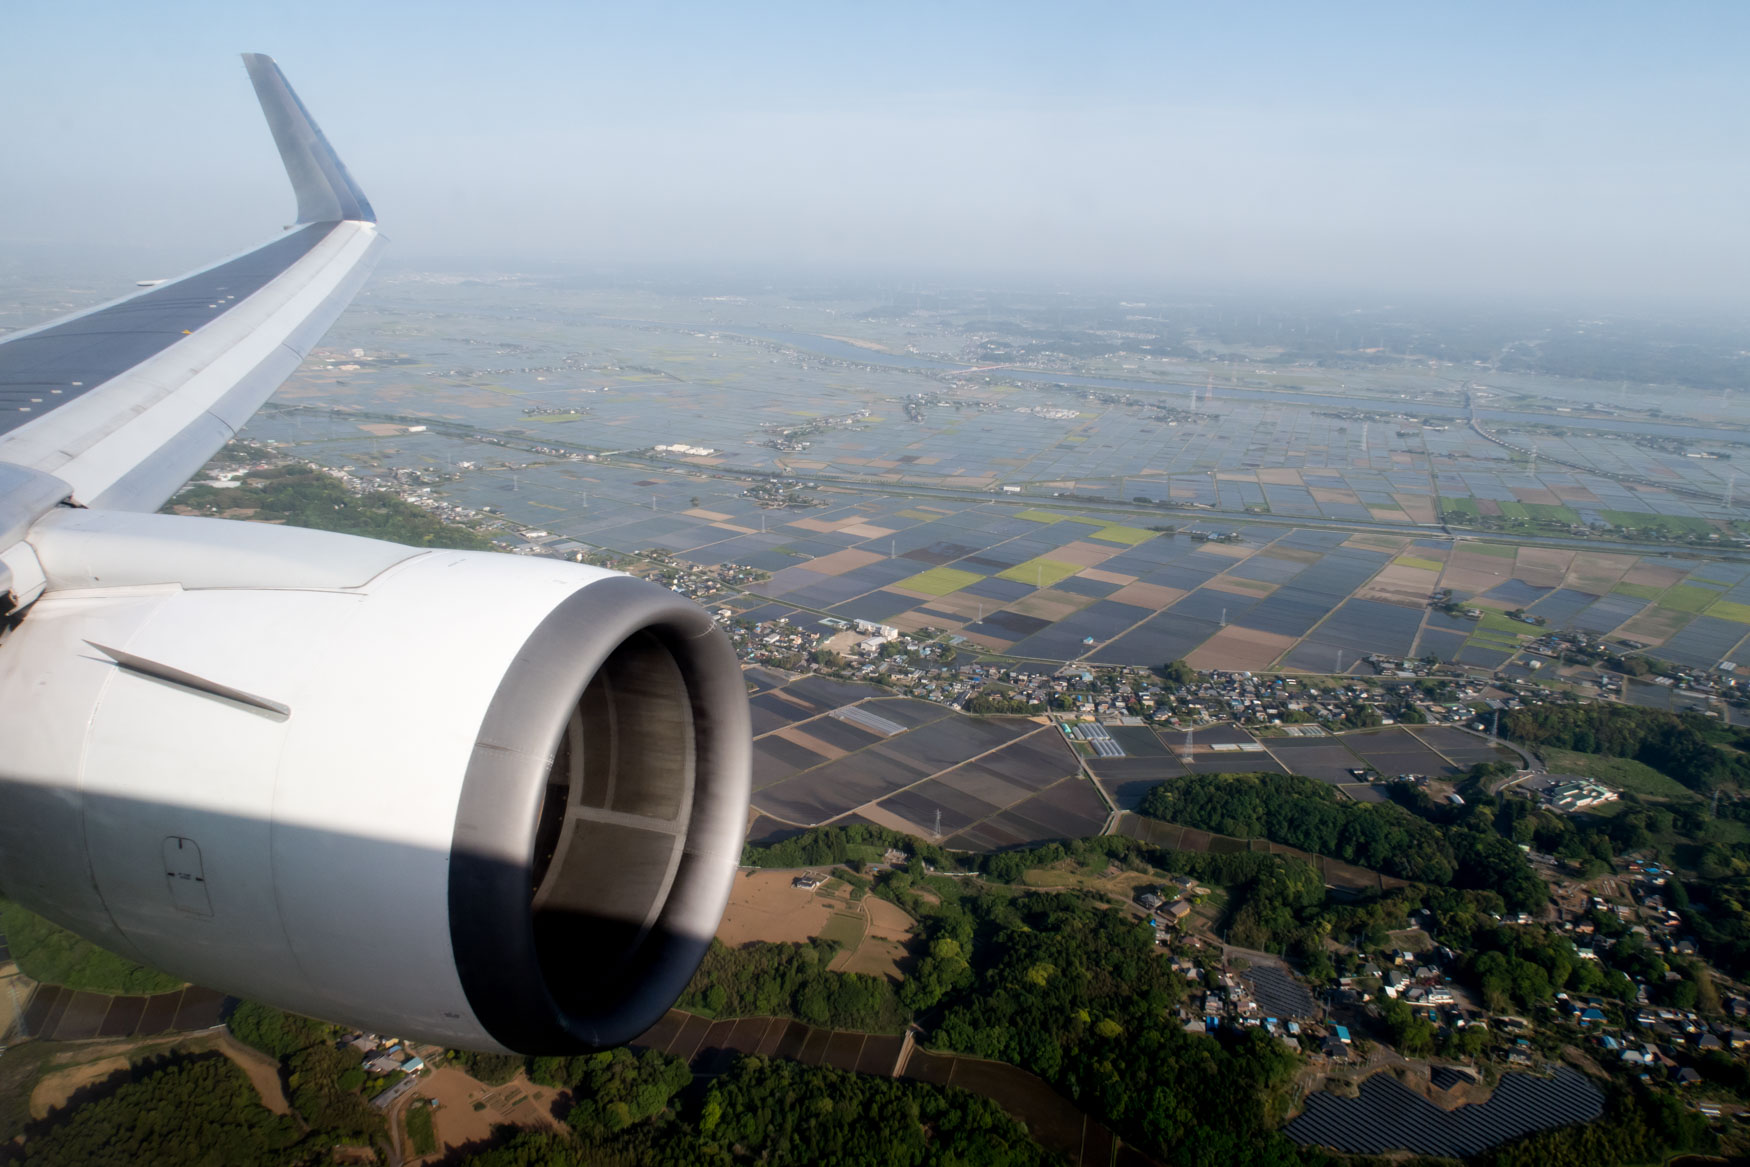 Approaching Tokyo Narita